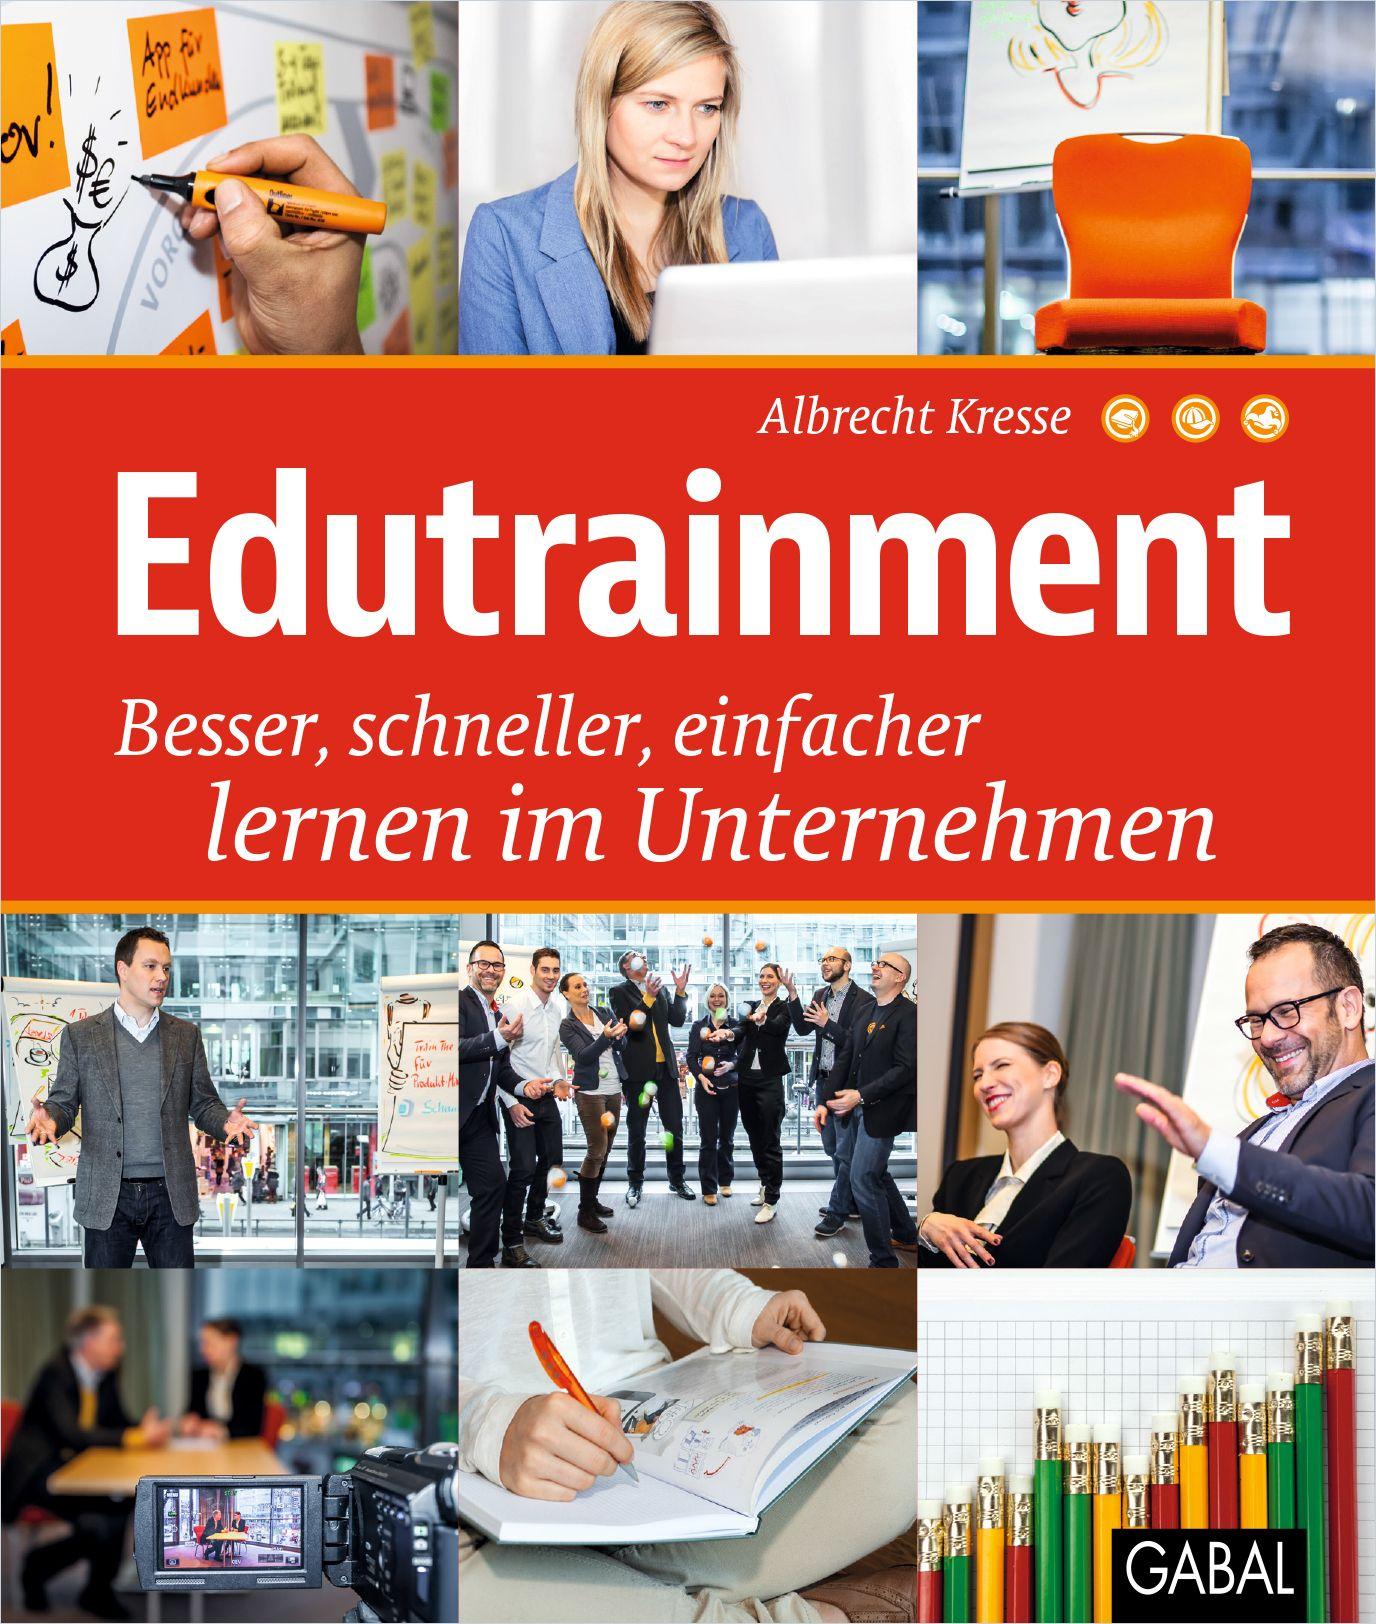 Image of: Edutrainment